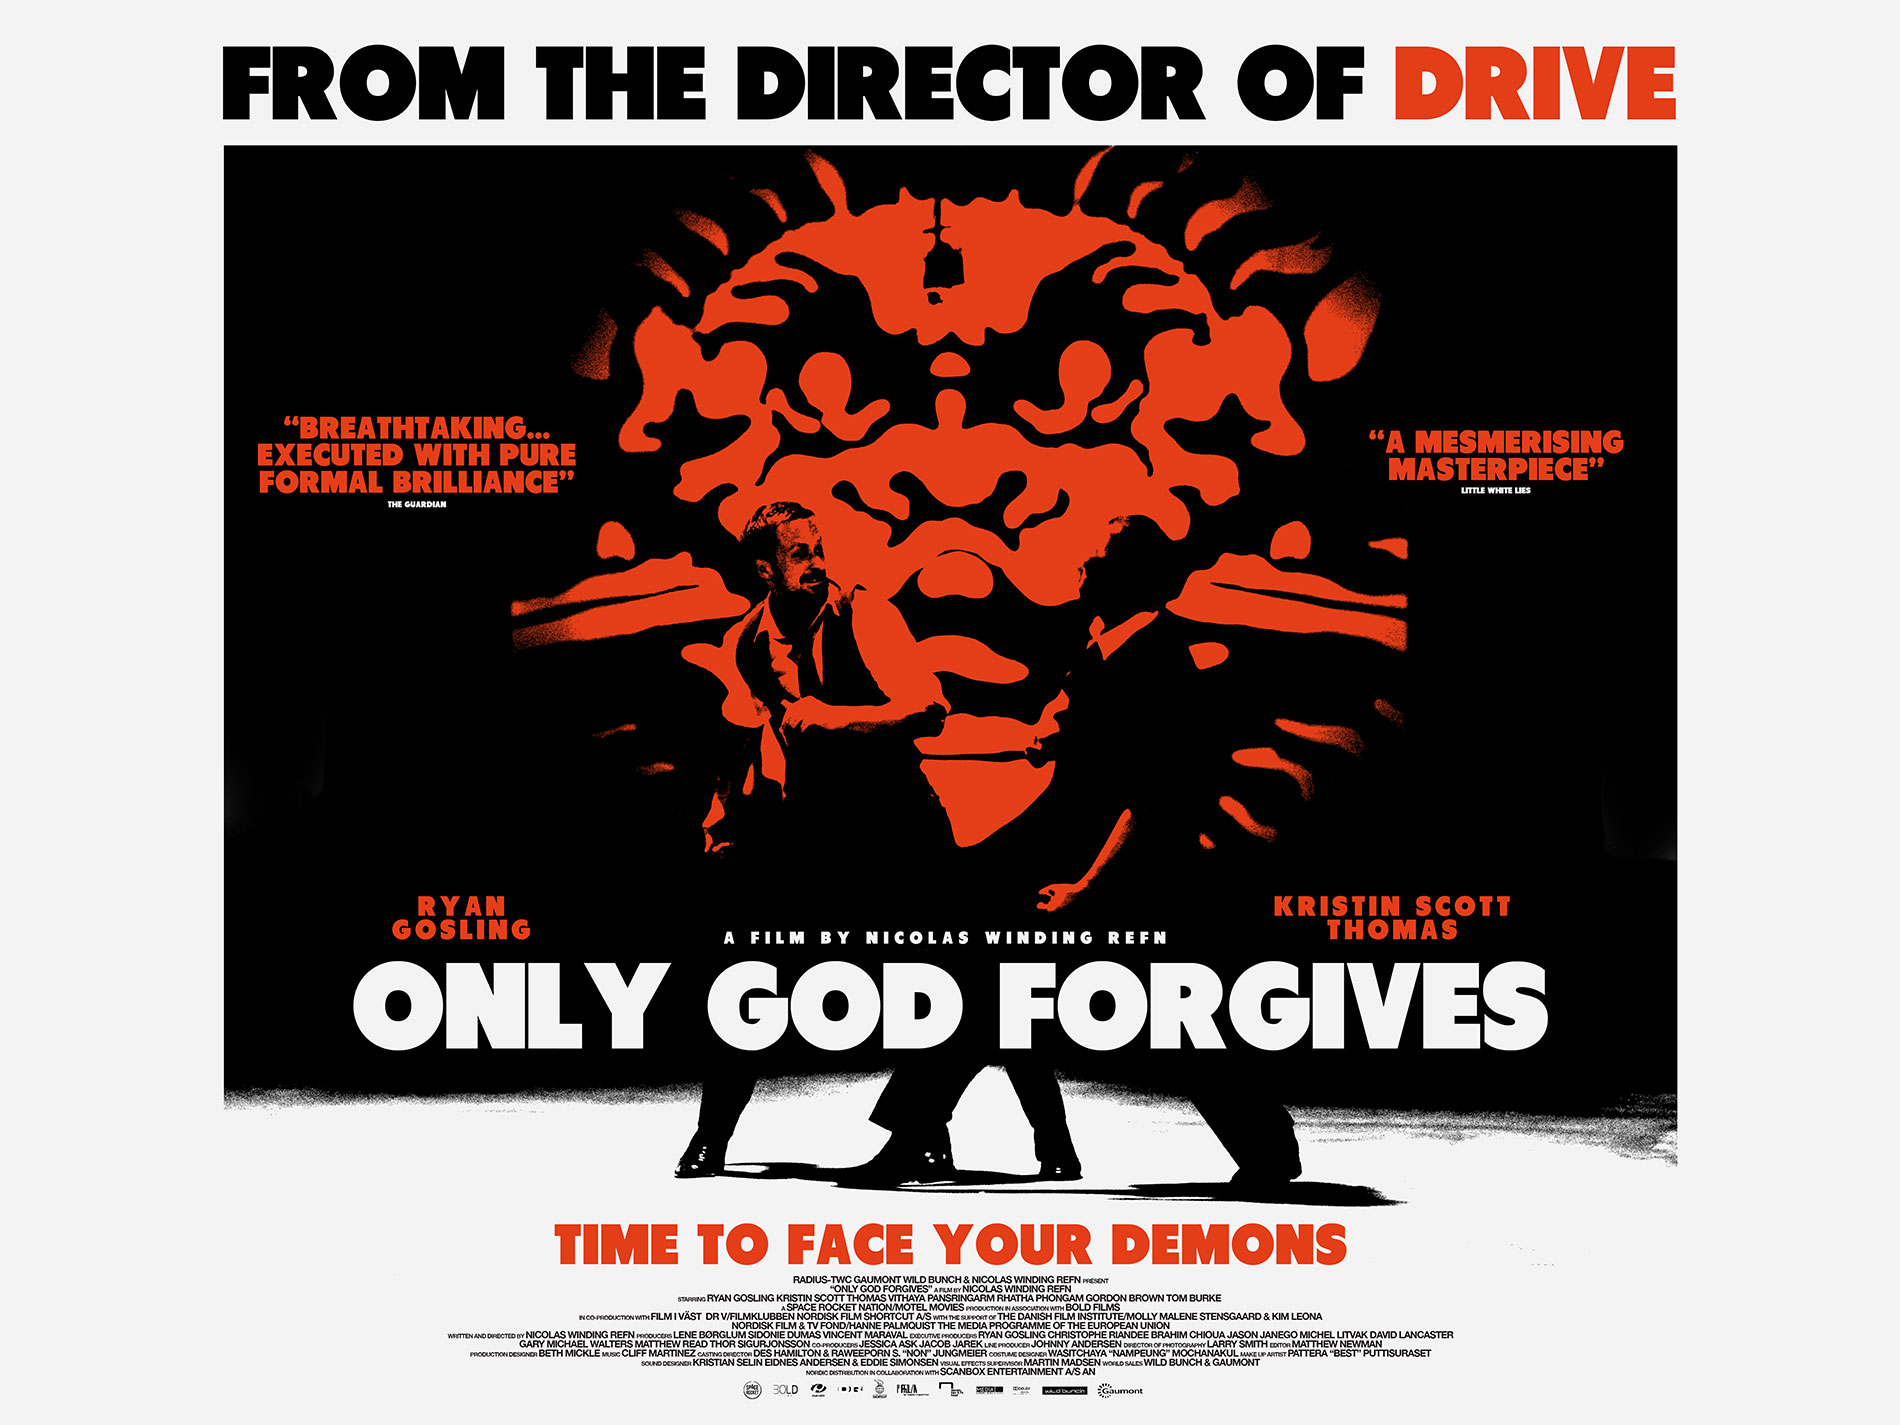 Only God Forgives Neon Poster Enter Little White Lie...